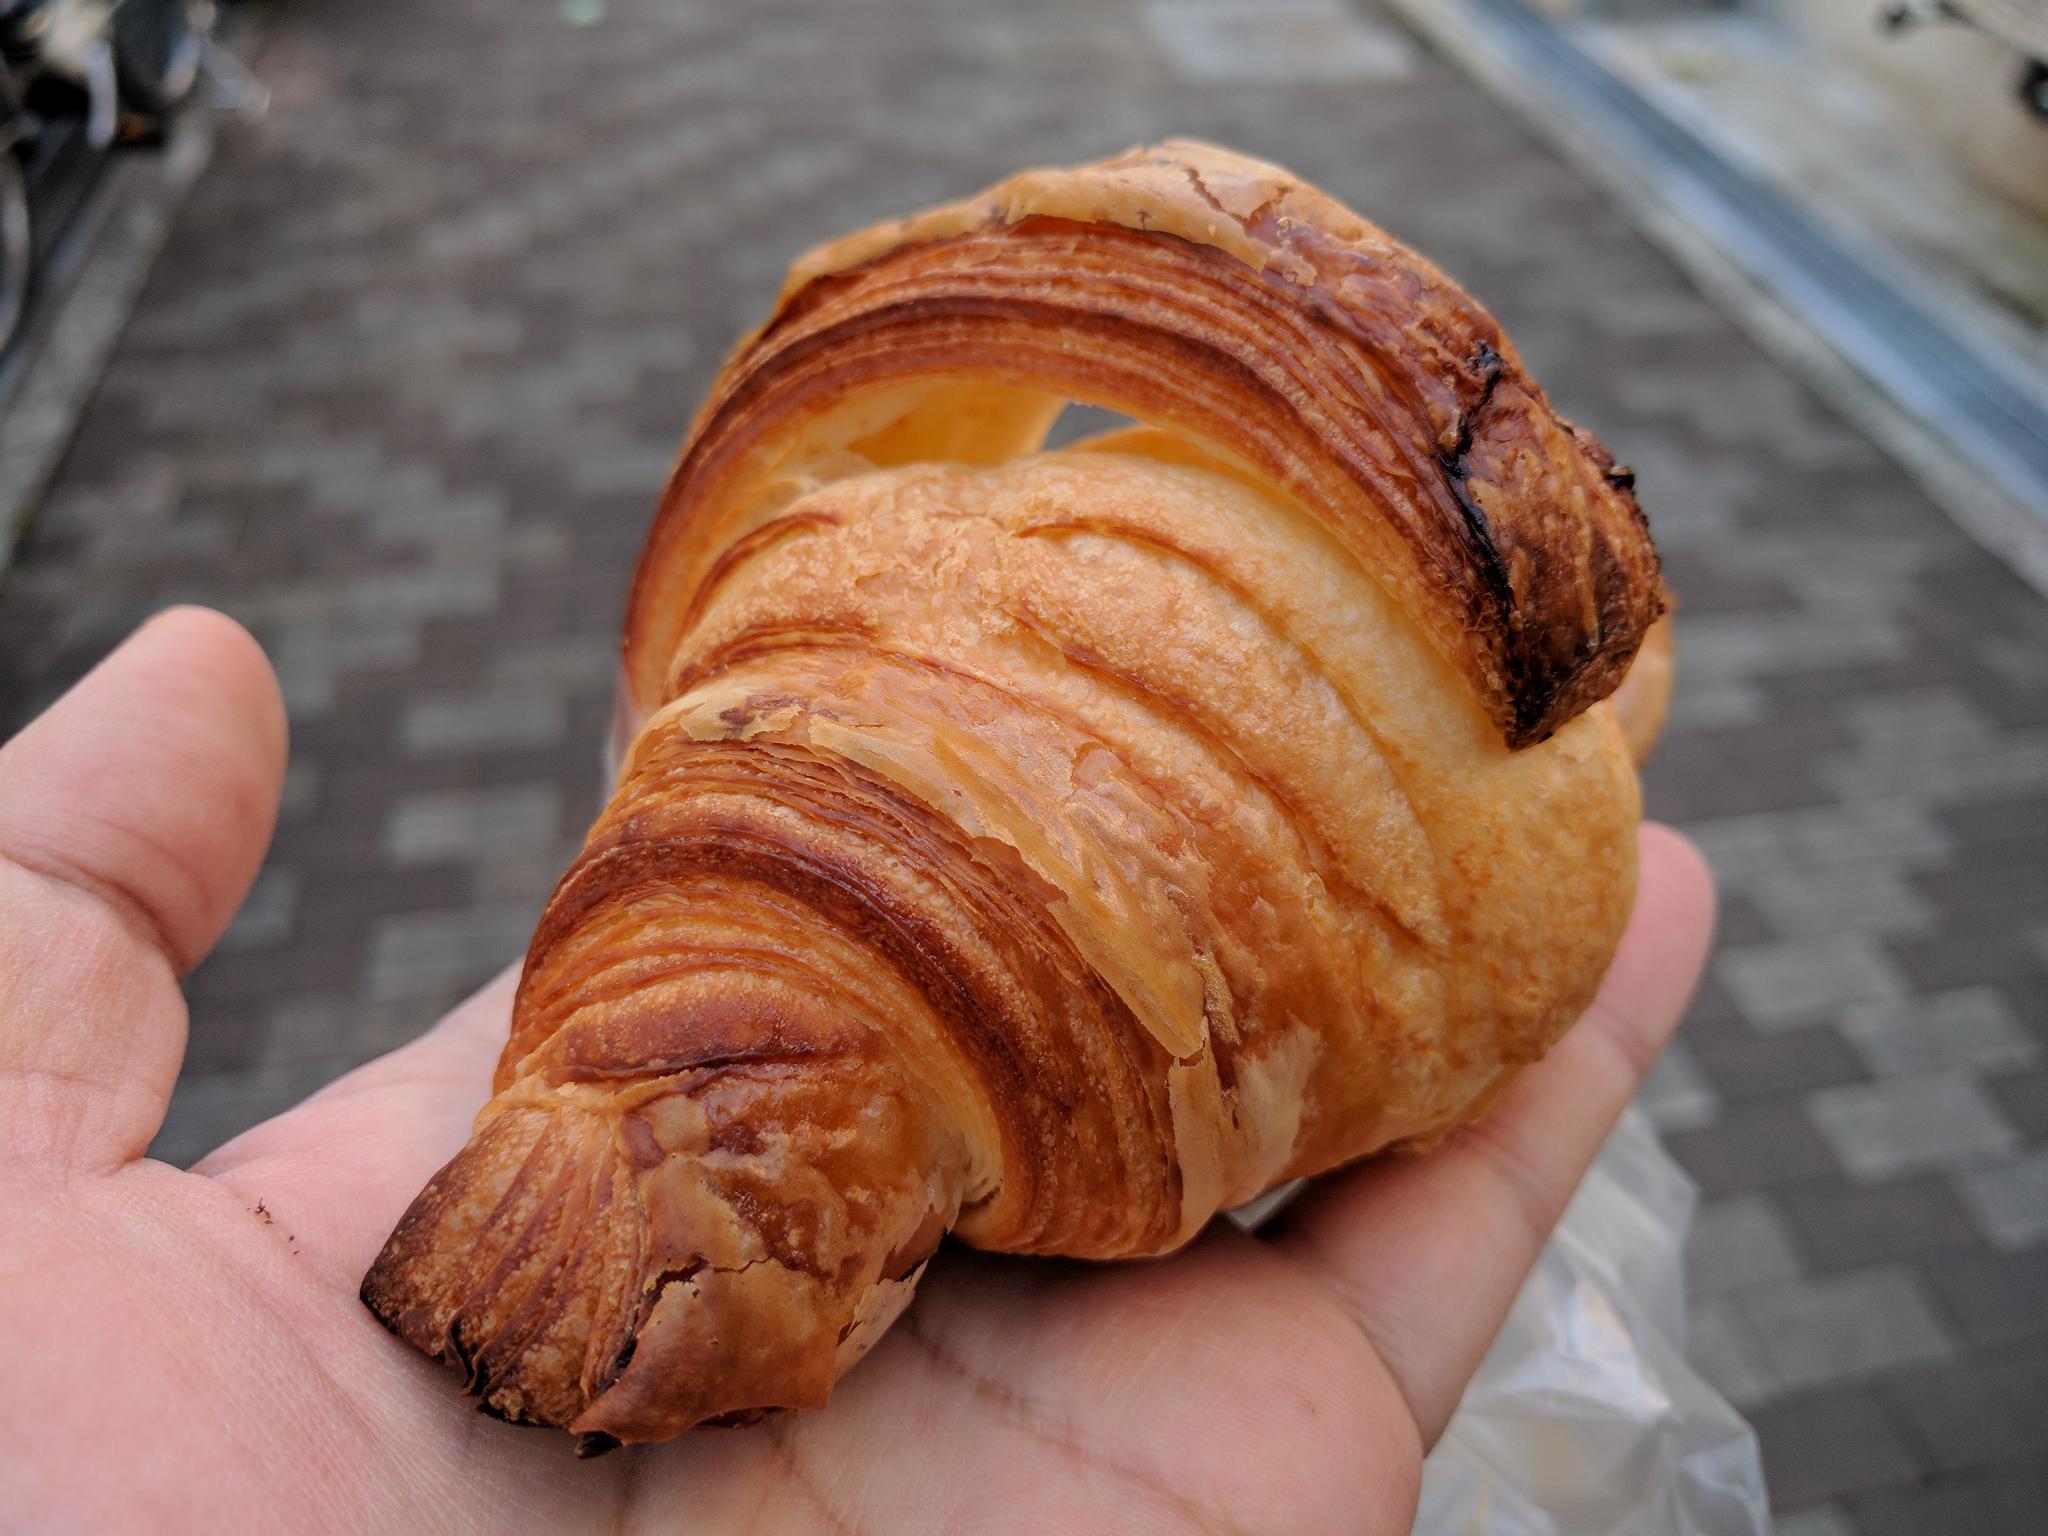 Delicioso Croissant sencillo listo para degustar.